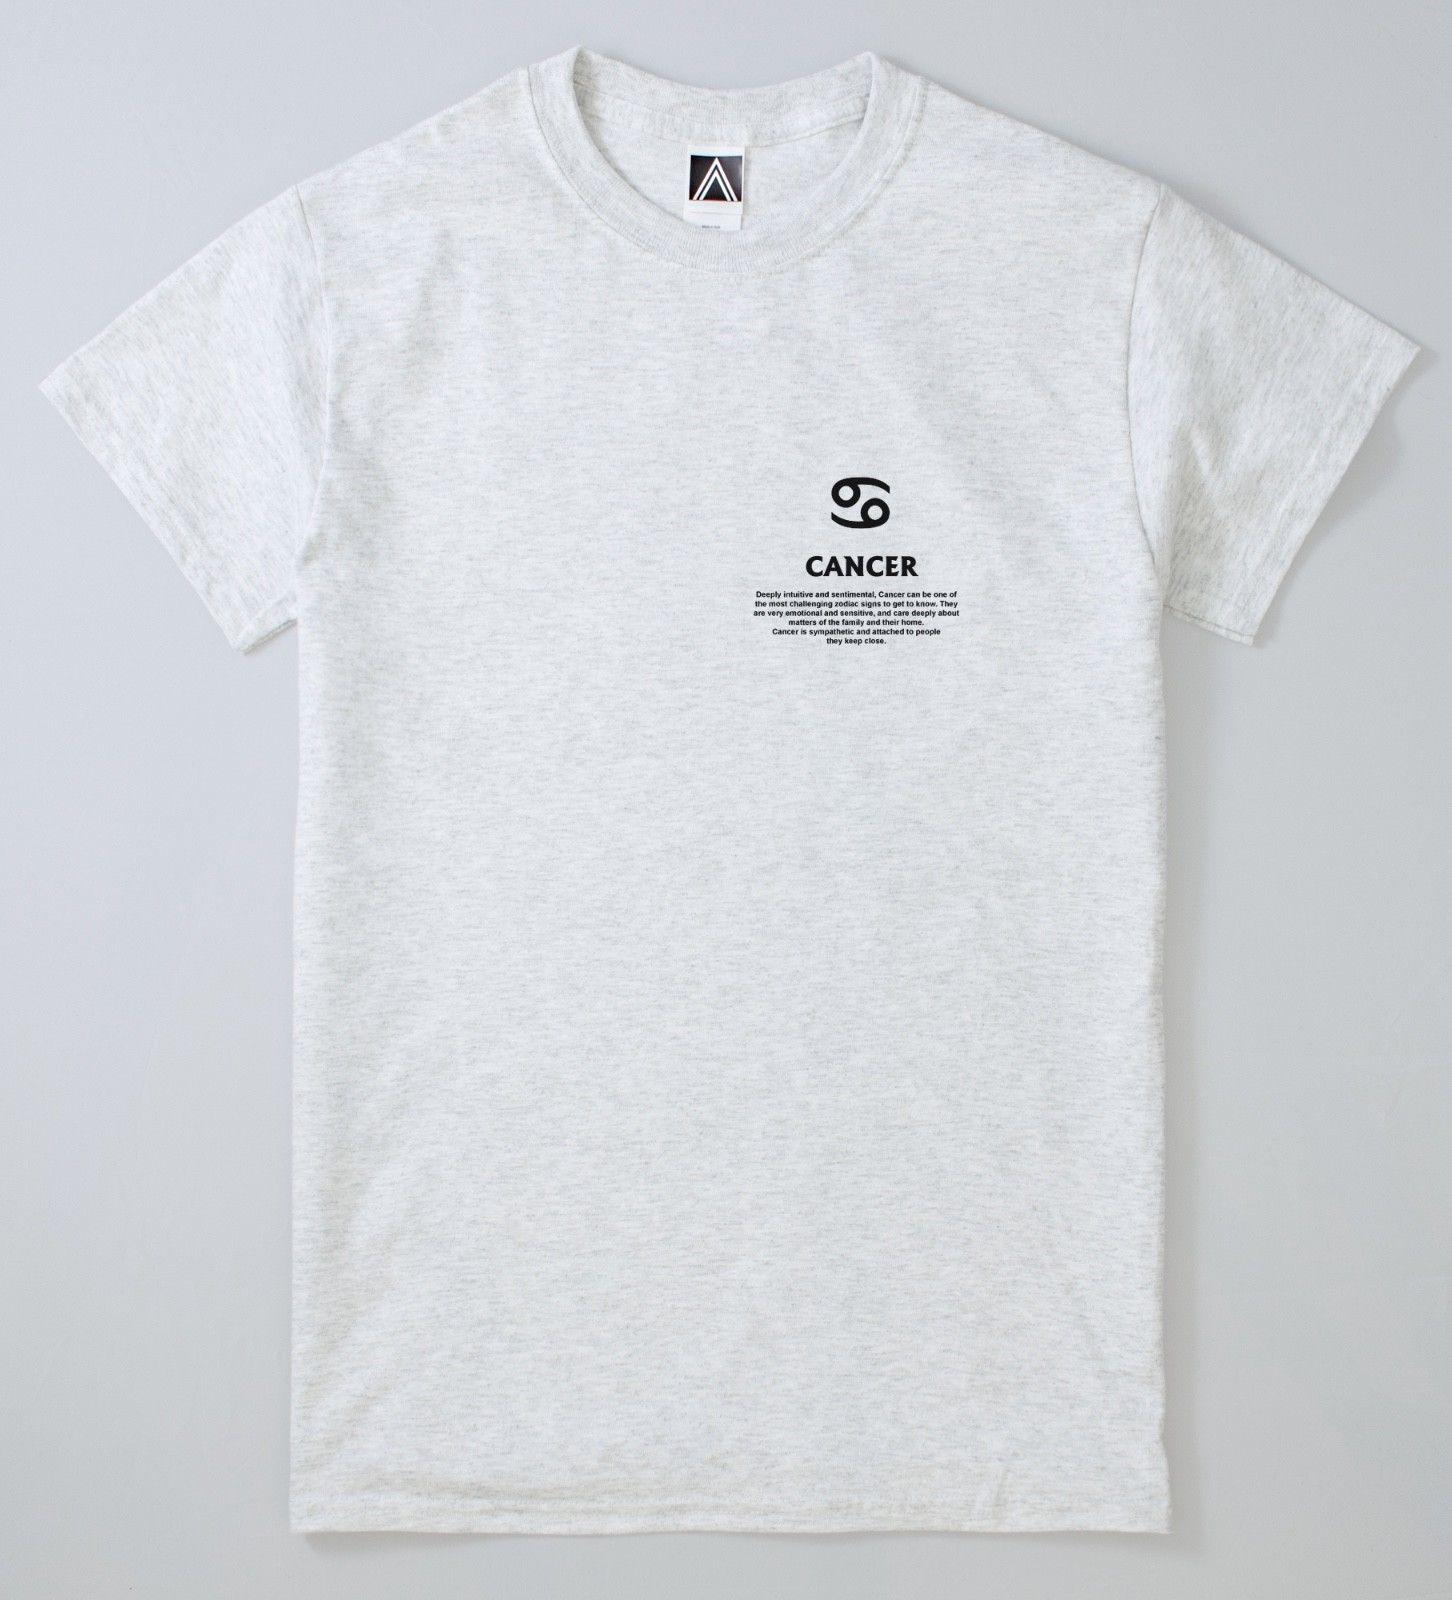 18df3d12 Cancer Zodiac T Shirt Crab Feelings Magic Tee Astrology Birthday Chart  TopShort Sleeve Plus Size T Shirt Colour Jersey Print T Shirt Be Awesome T  Shirt ...